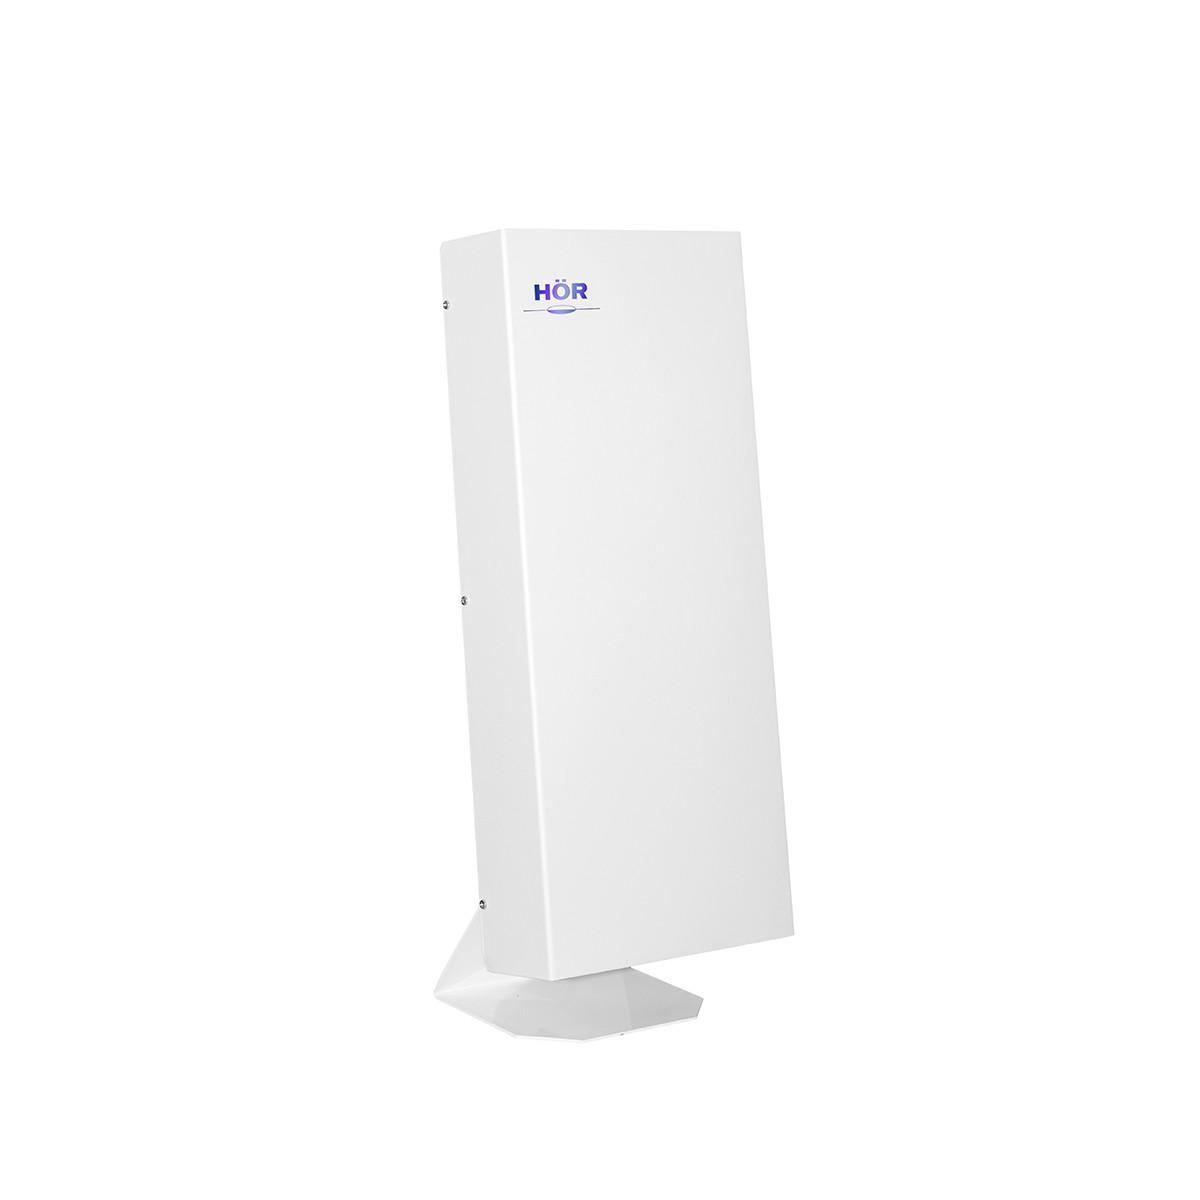 Бактерицидный рециркулятор воздуха HÖR-А30